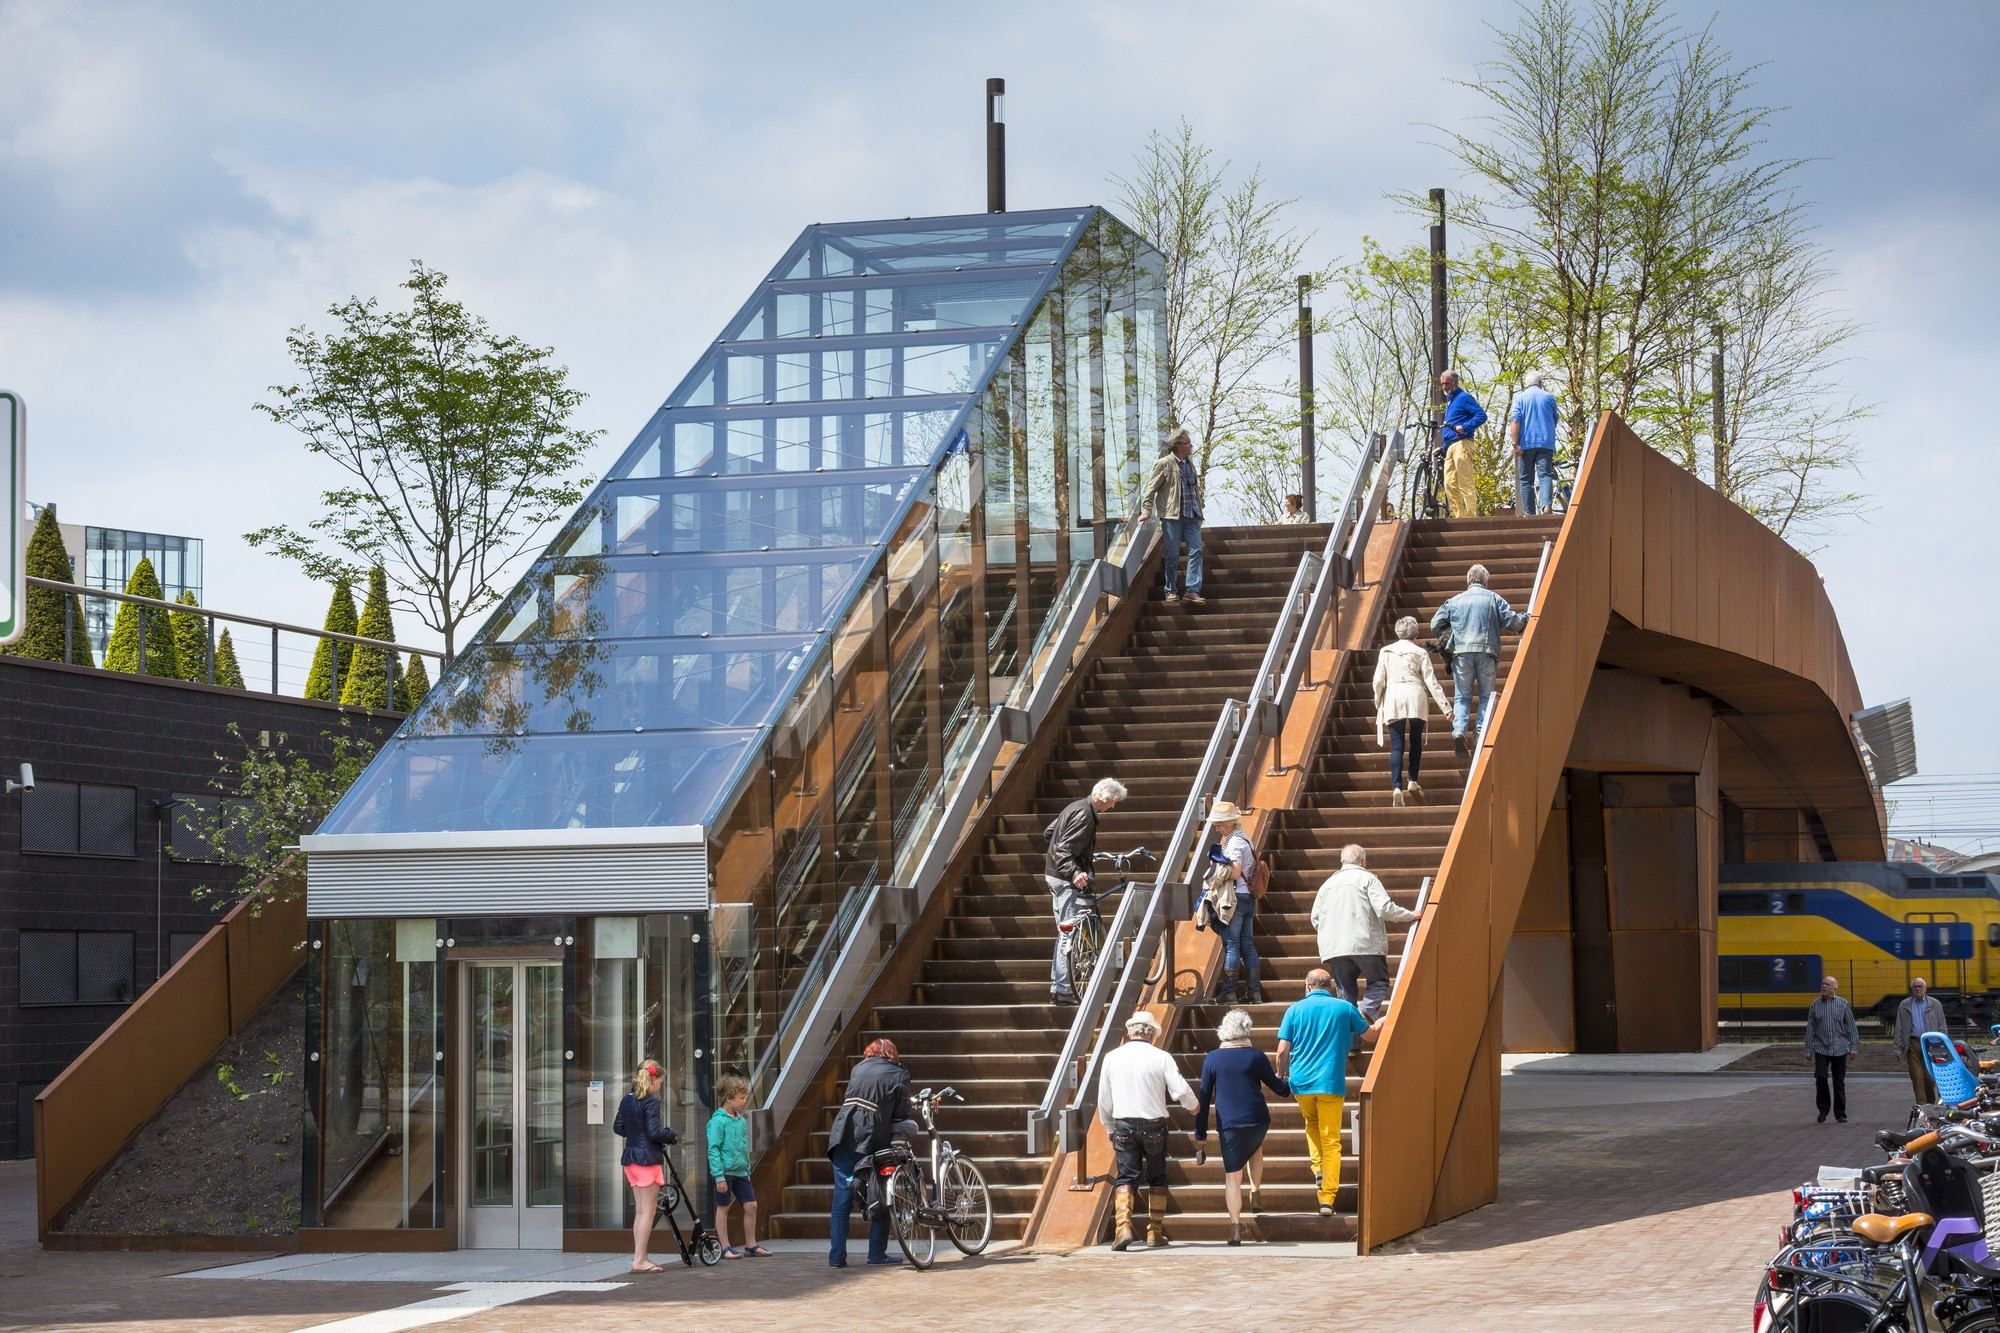 Paleisbrug - Palace Bridge| Benthem Crouwel Architects